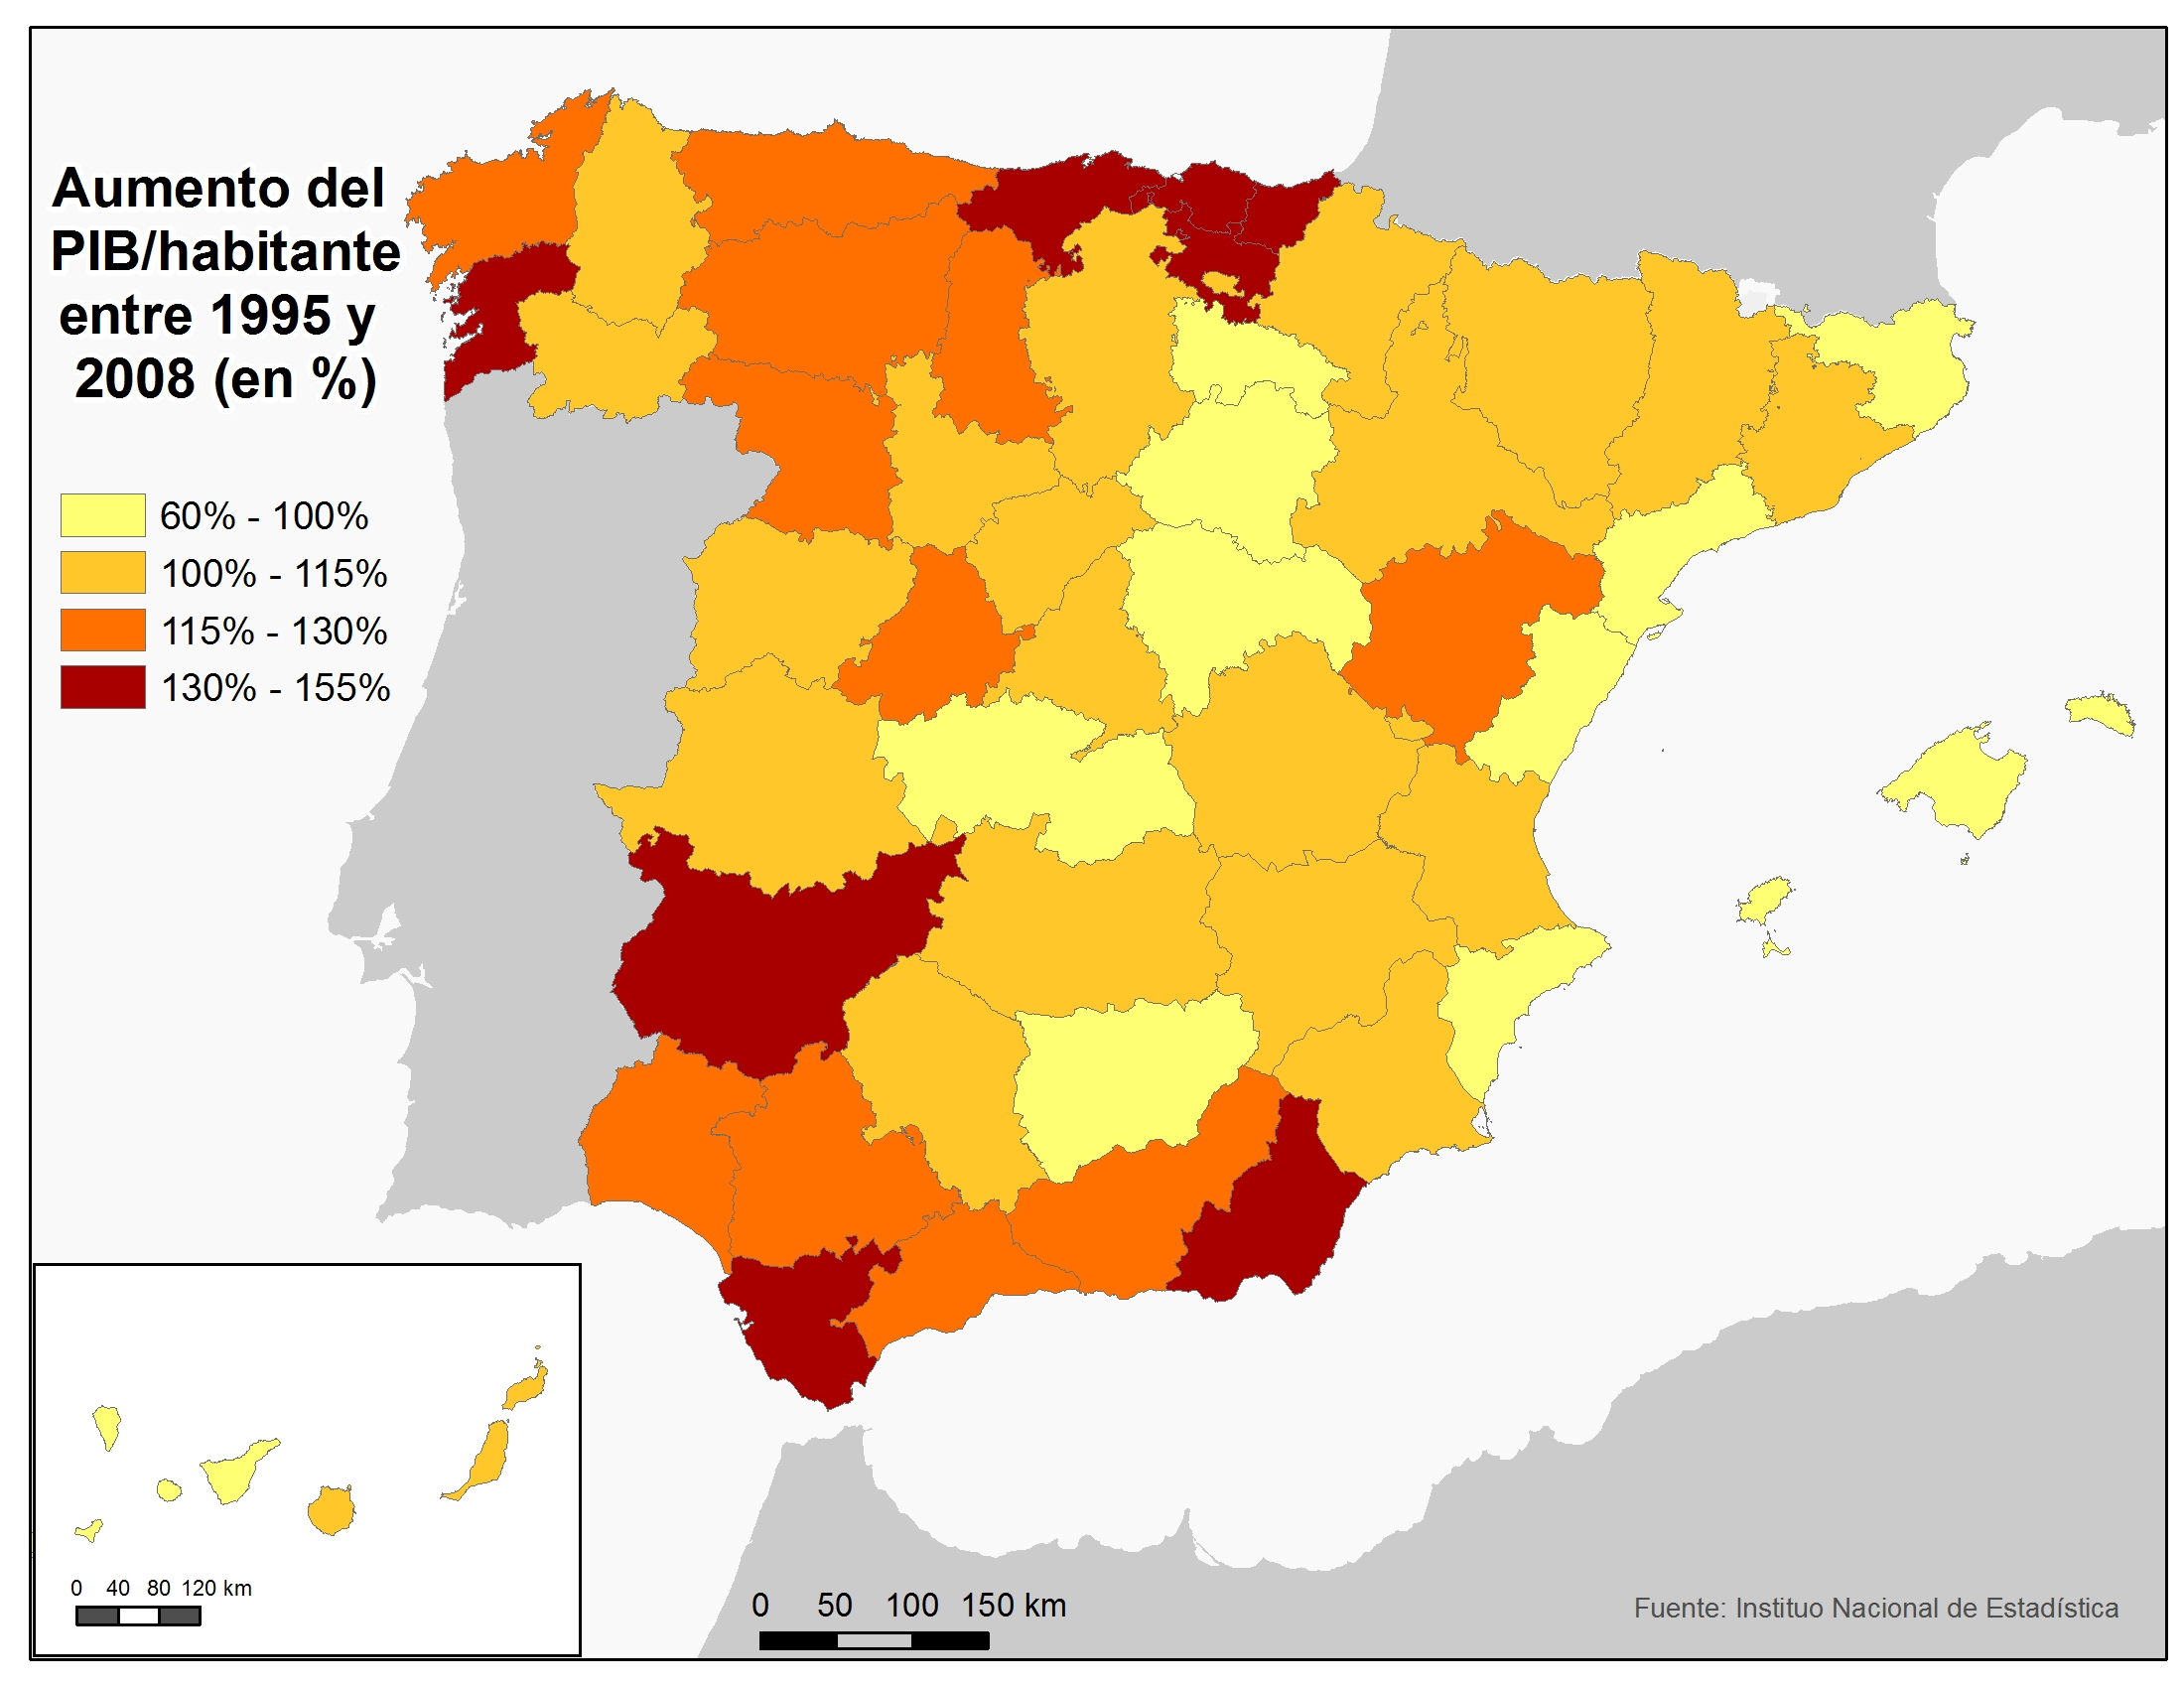 Mapa Economico De España.Mapa Economico De Espana